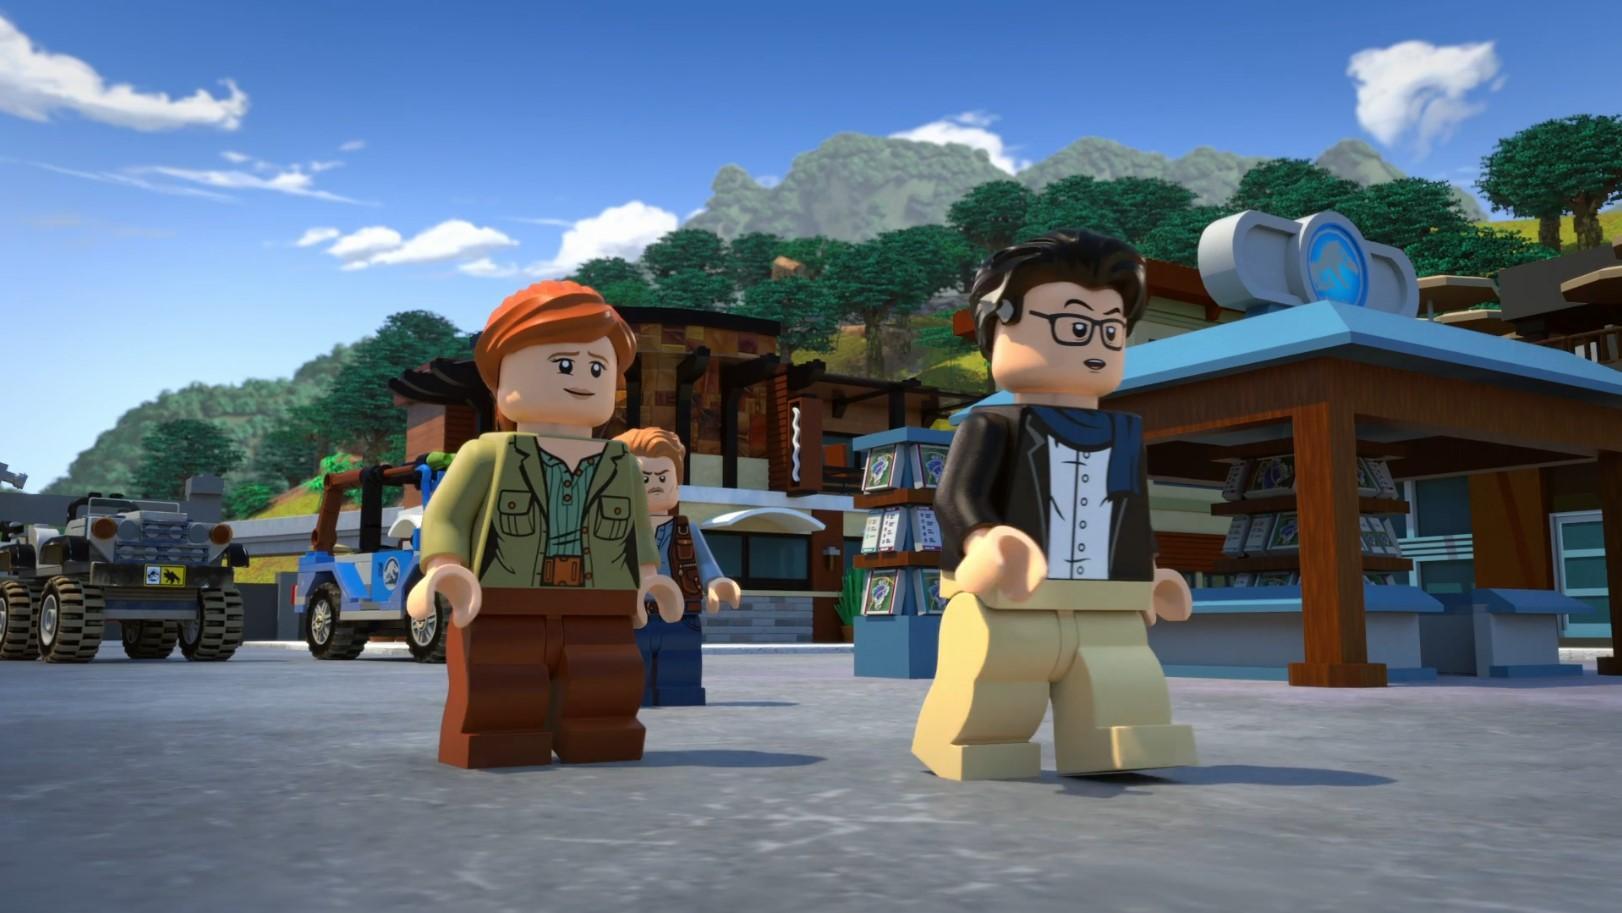 LEGO Мир Юрского периода. Легенда острова Нублар